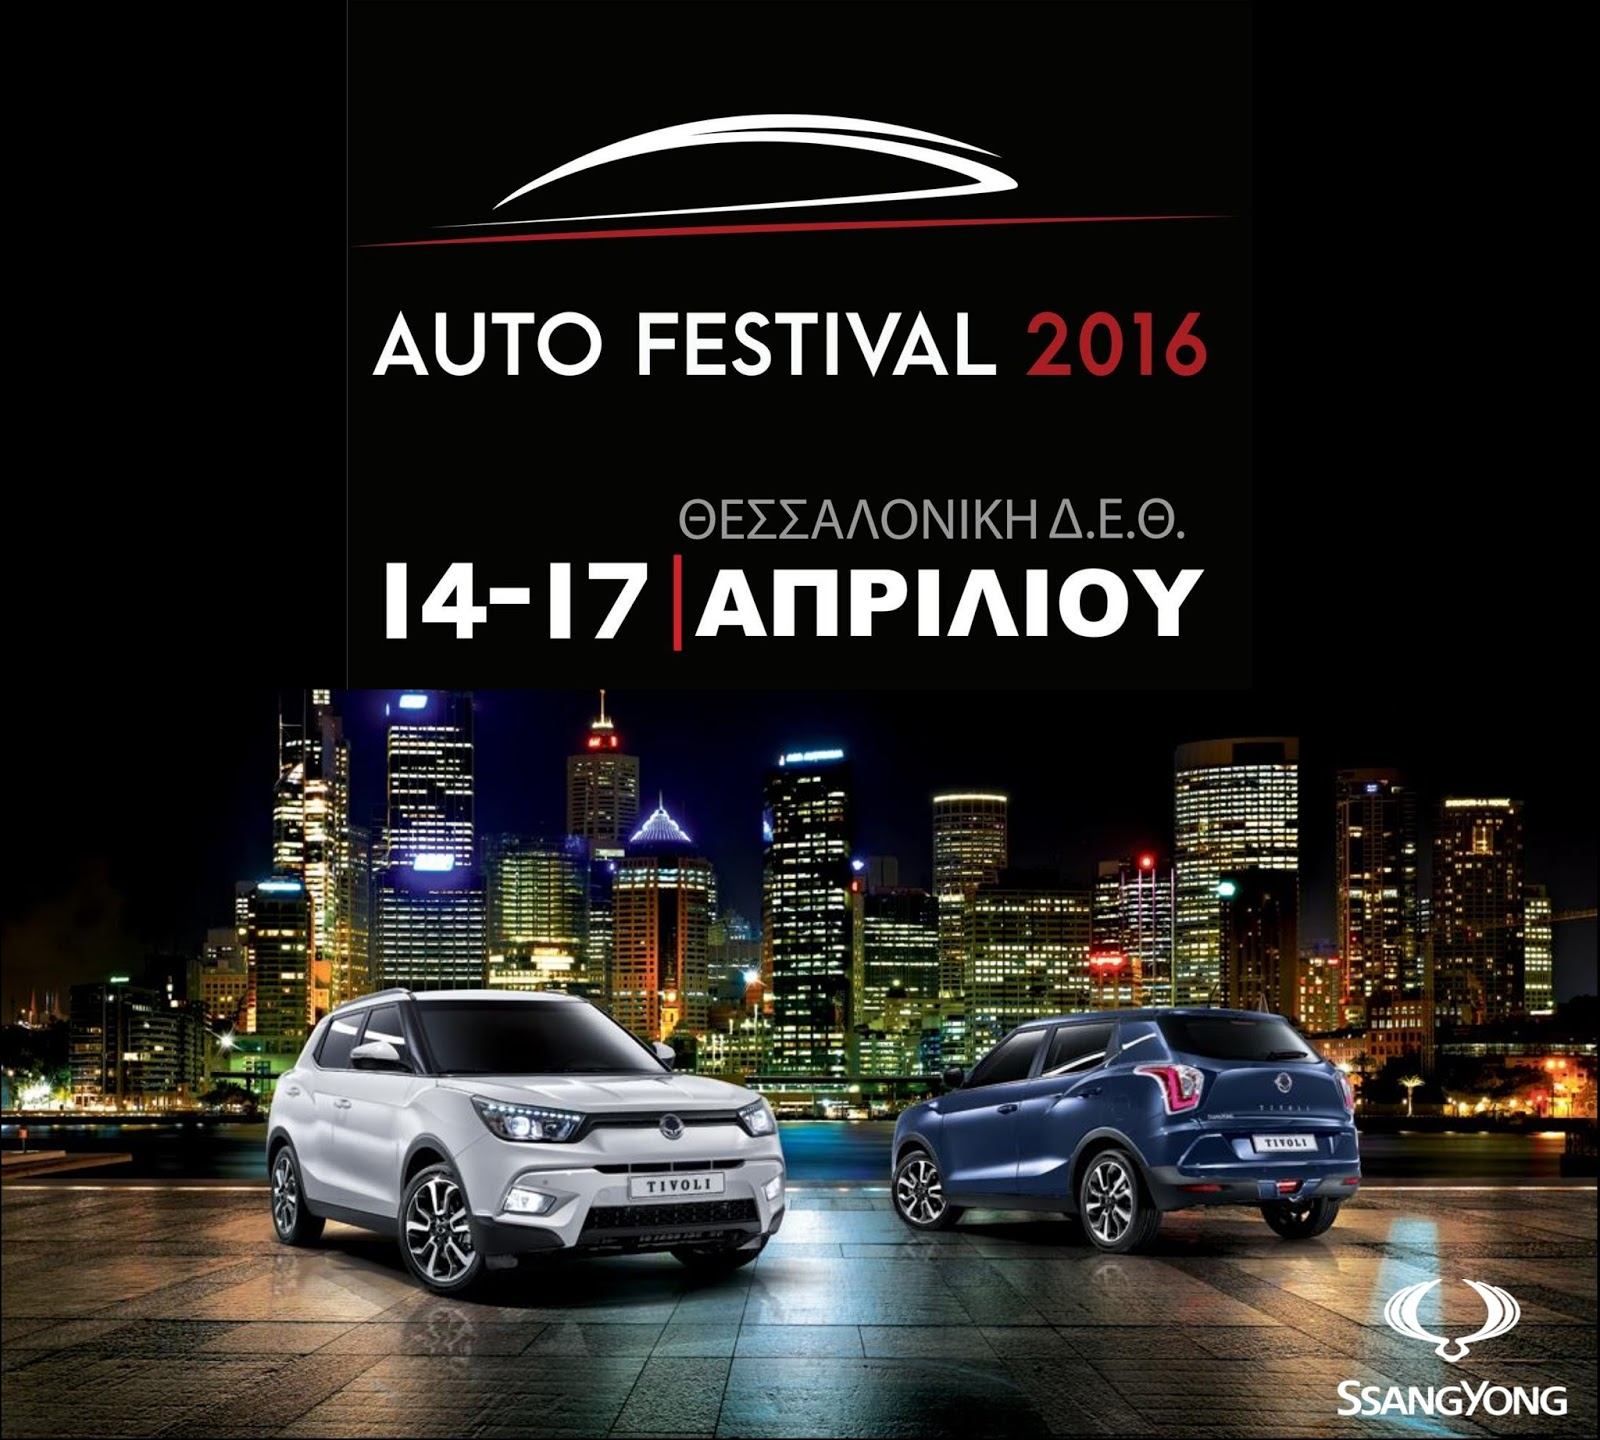 SY2BAuto2BFestival2B2016 pagenumber.0012B252812529 Η SsangYong πάει Θεσσαλονίκη με το «Auto Festival 2016» Auto Festival, autoshow, SsangYong, SsangYong Tivoli